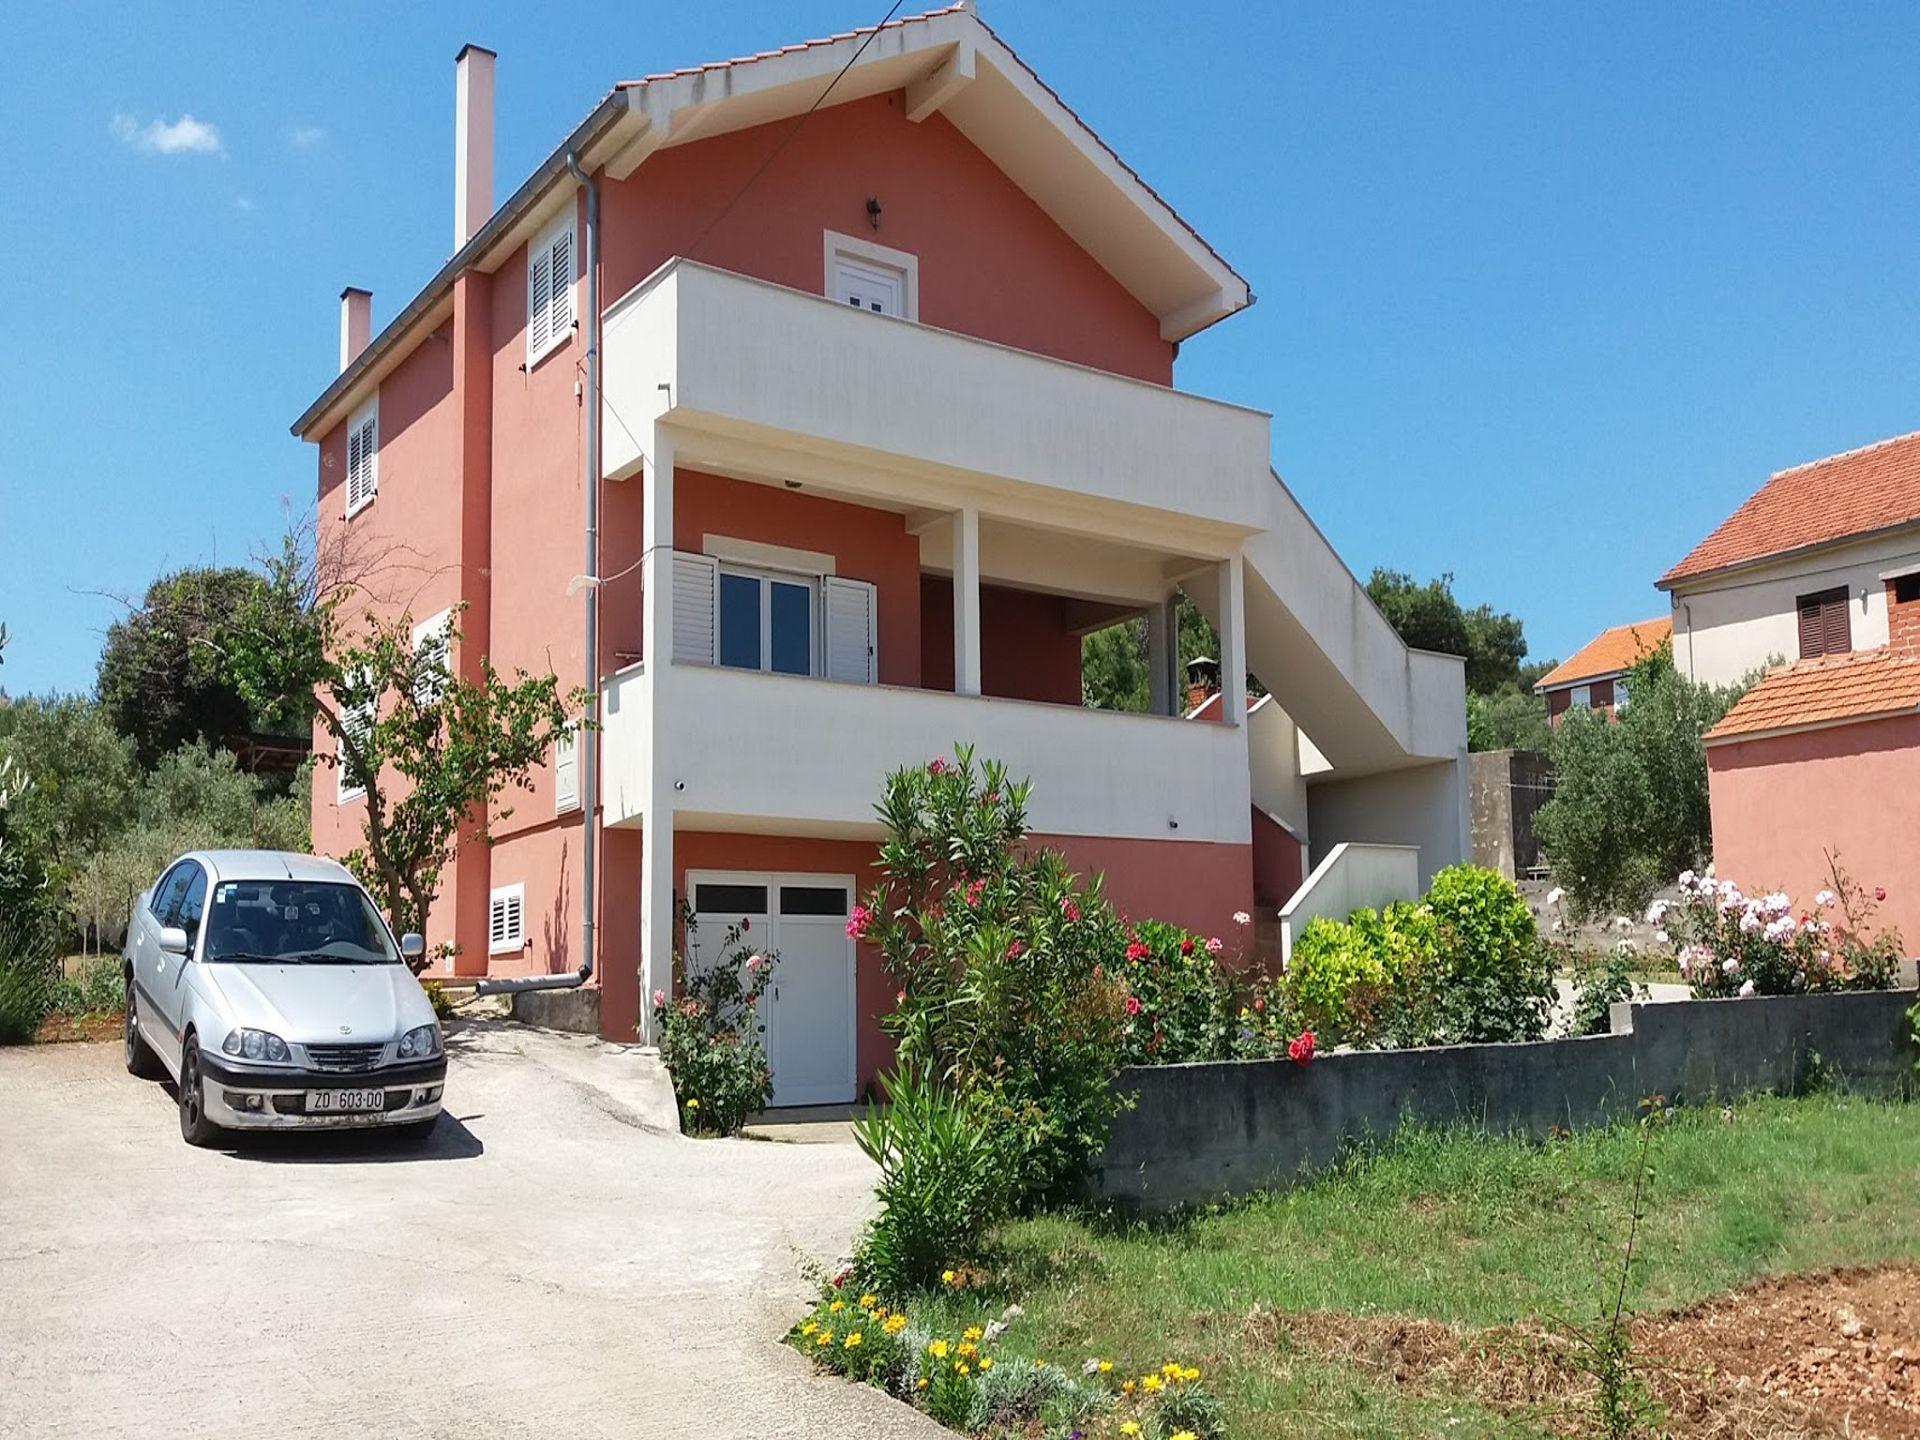 Mare - Dobropoljana - Appartements Croatie